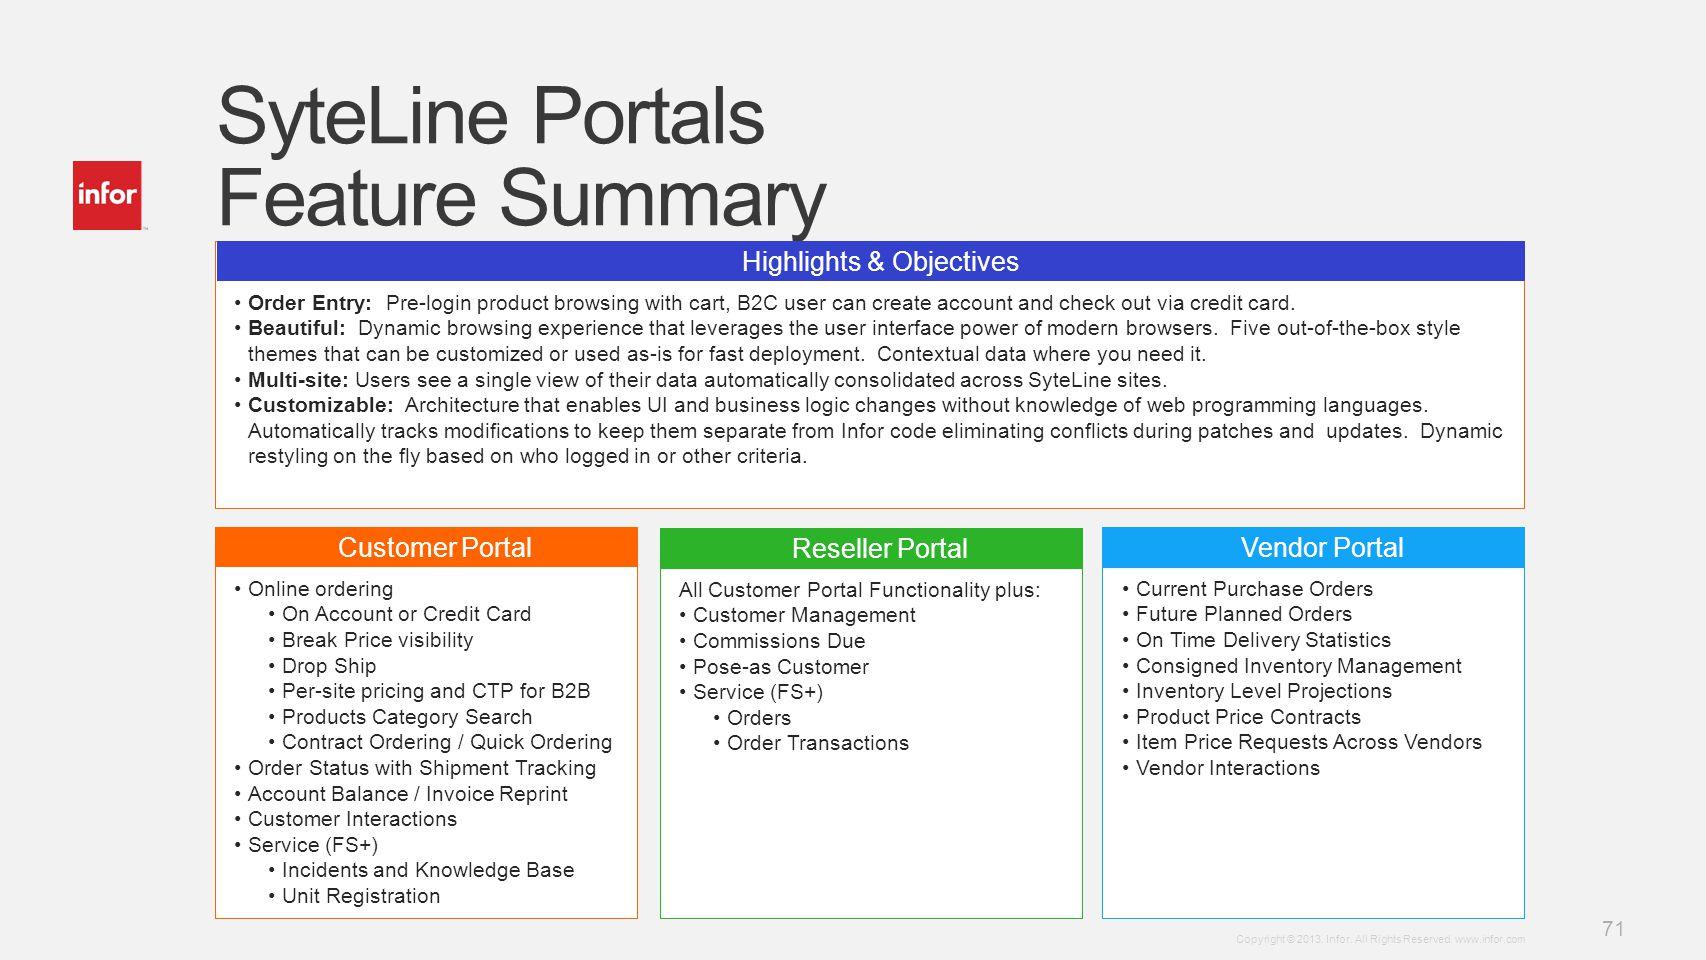 SyteLine Portals Feature Summary